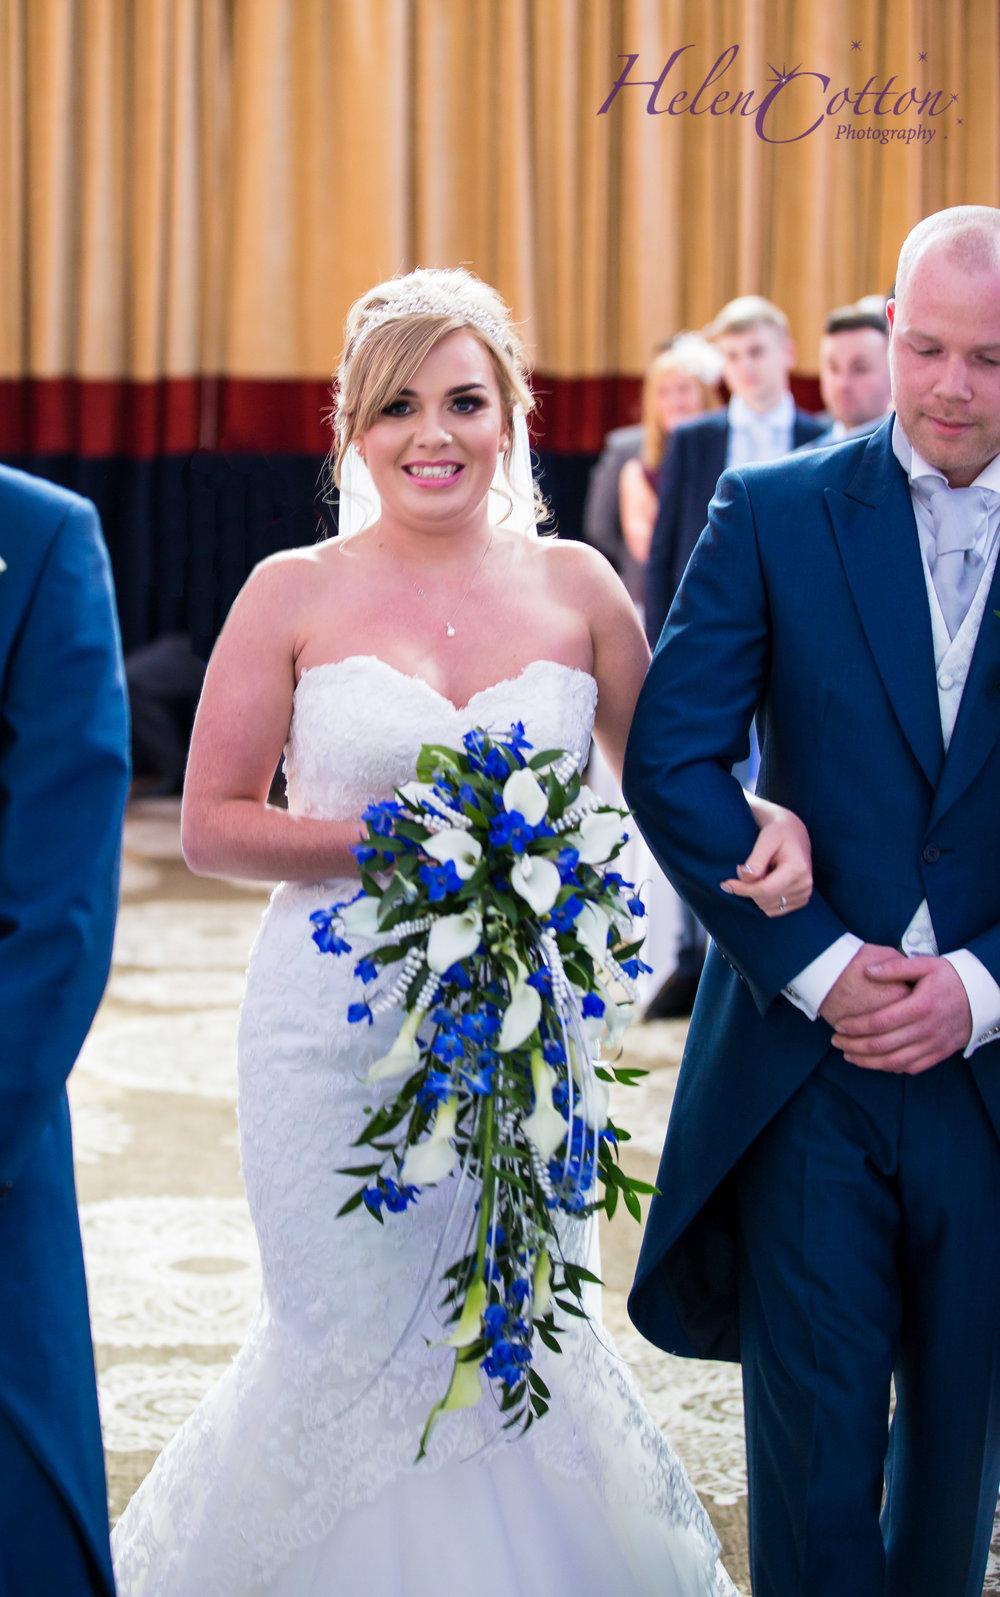 Emily & Chris's Wedding_WEB Wedding_Helen Cotton Photography©IMG_1115-Edit.JPG